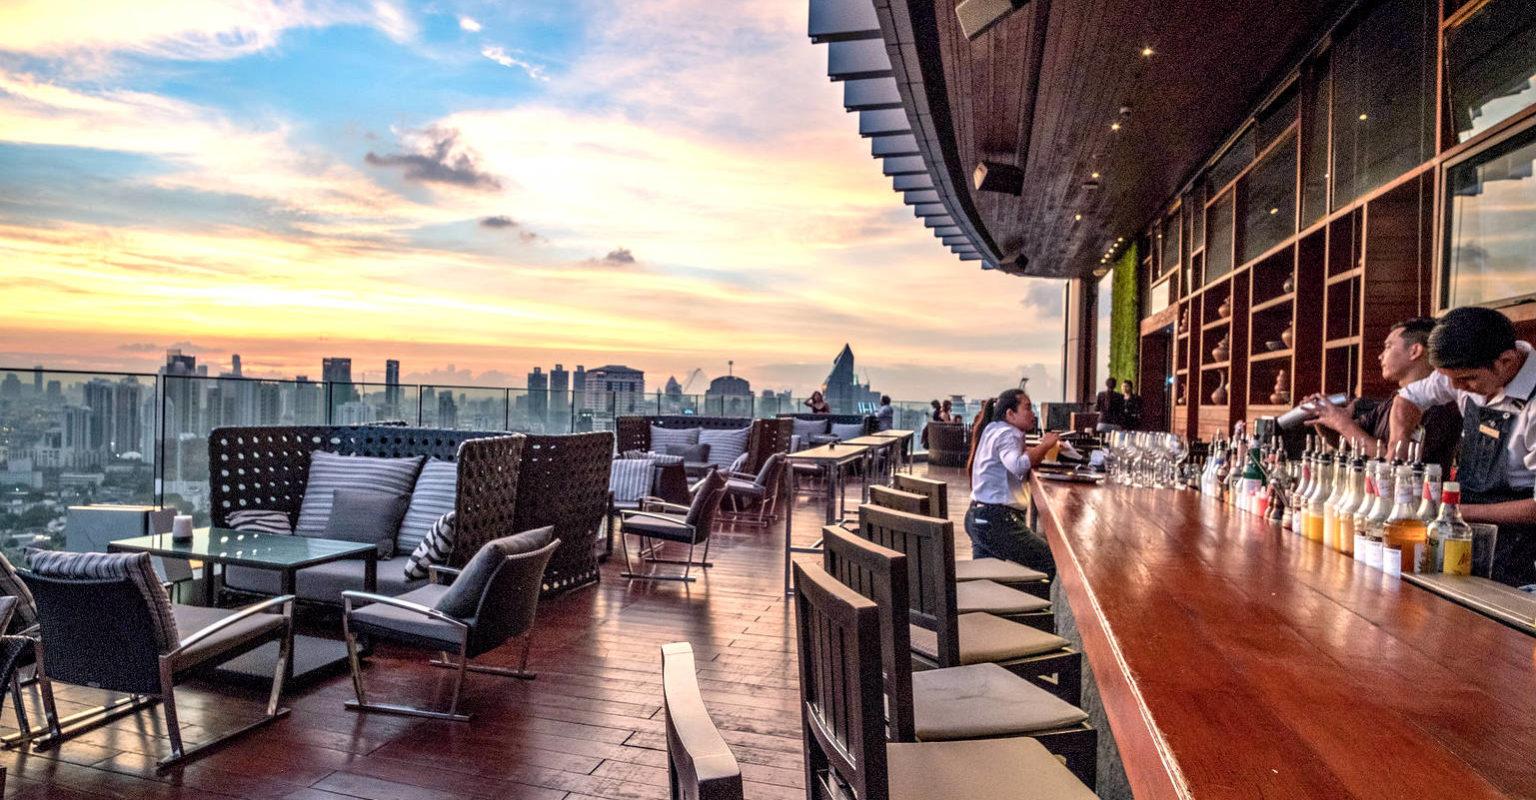 Bar van Octave Lounge & Bar in Bangkok